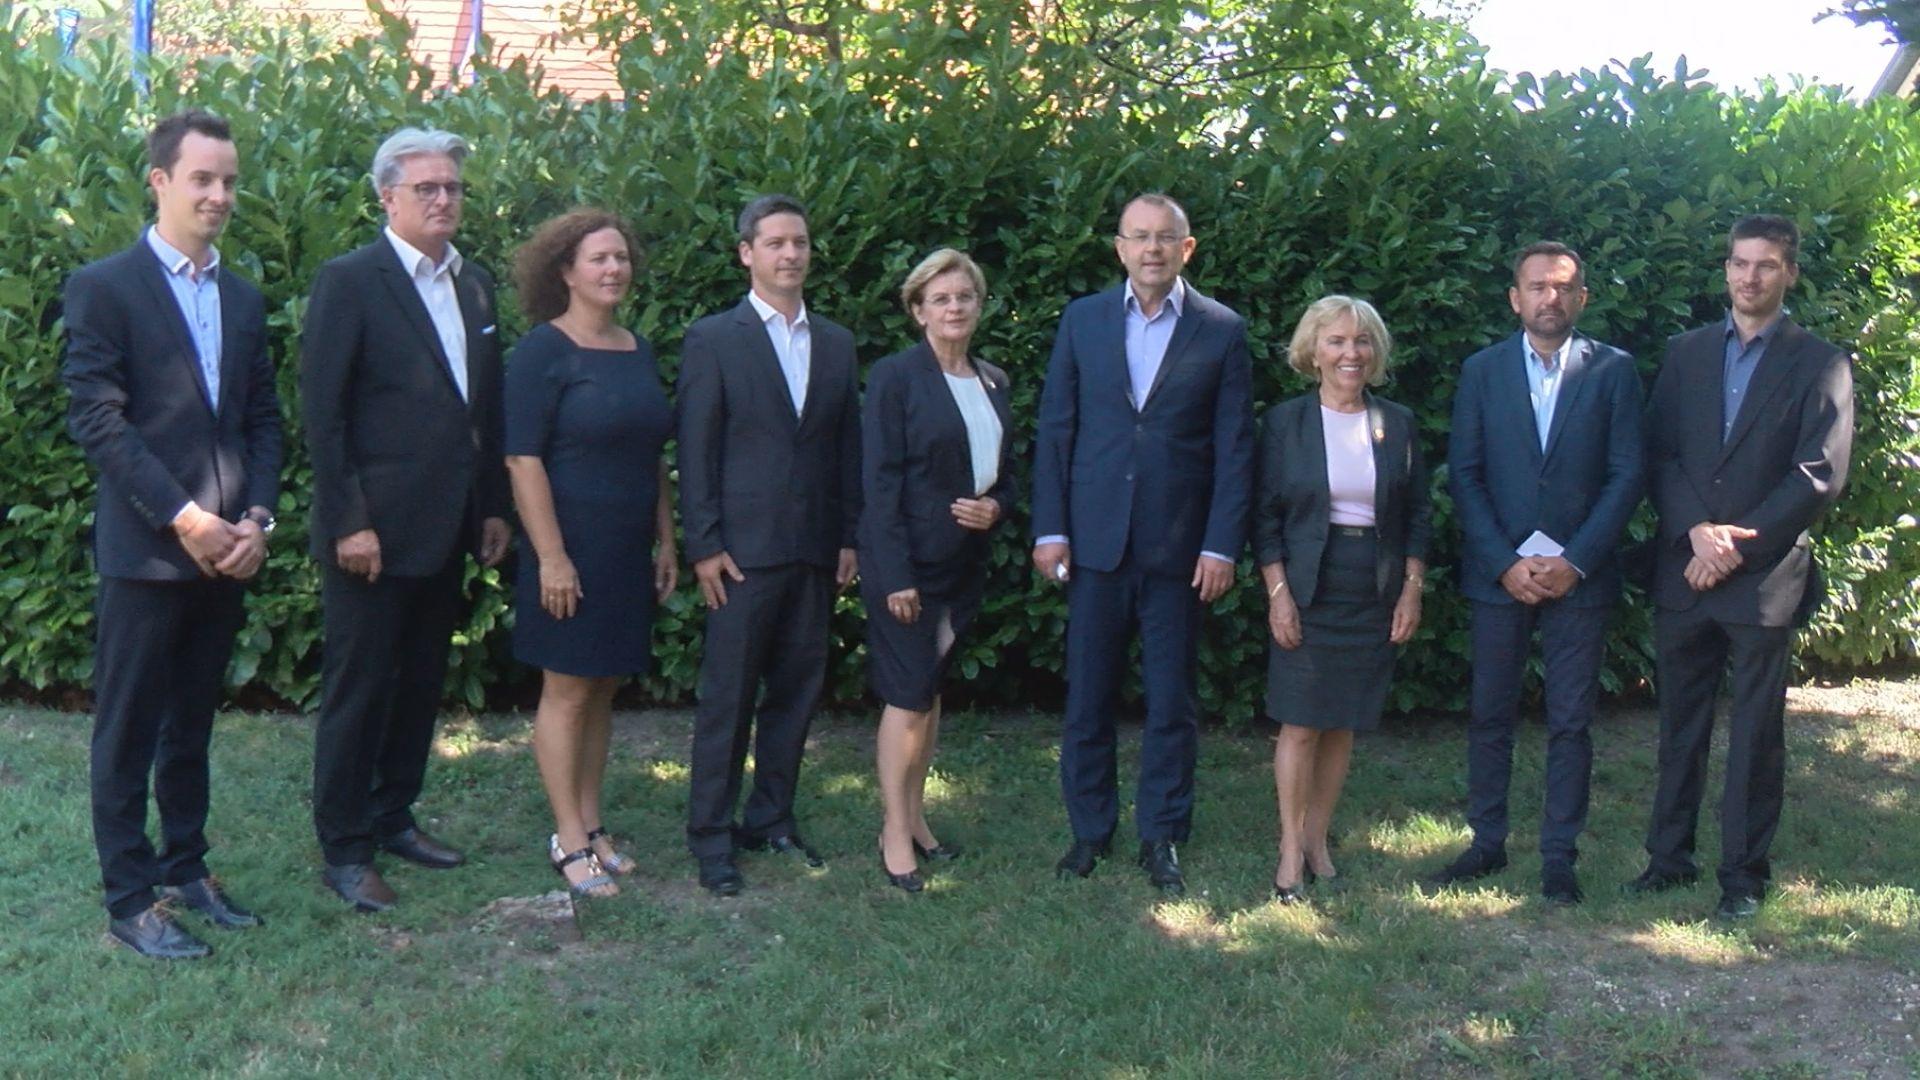 Bemutatta önkormányzati képviselő-jelöltjeit a FIDESZ-KDNP